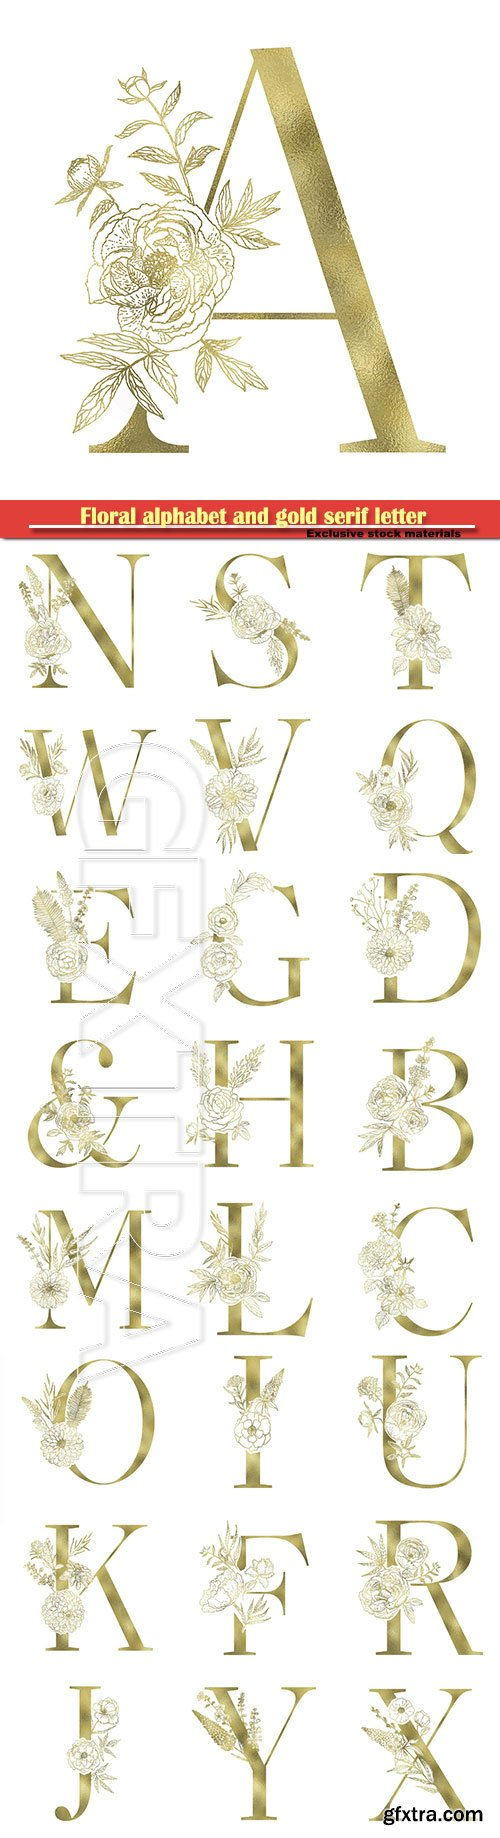 Floral alphabet and gold serif letter, vector decorative ABC